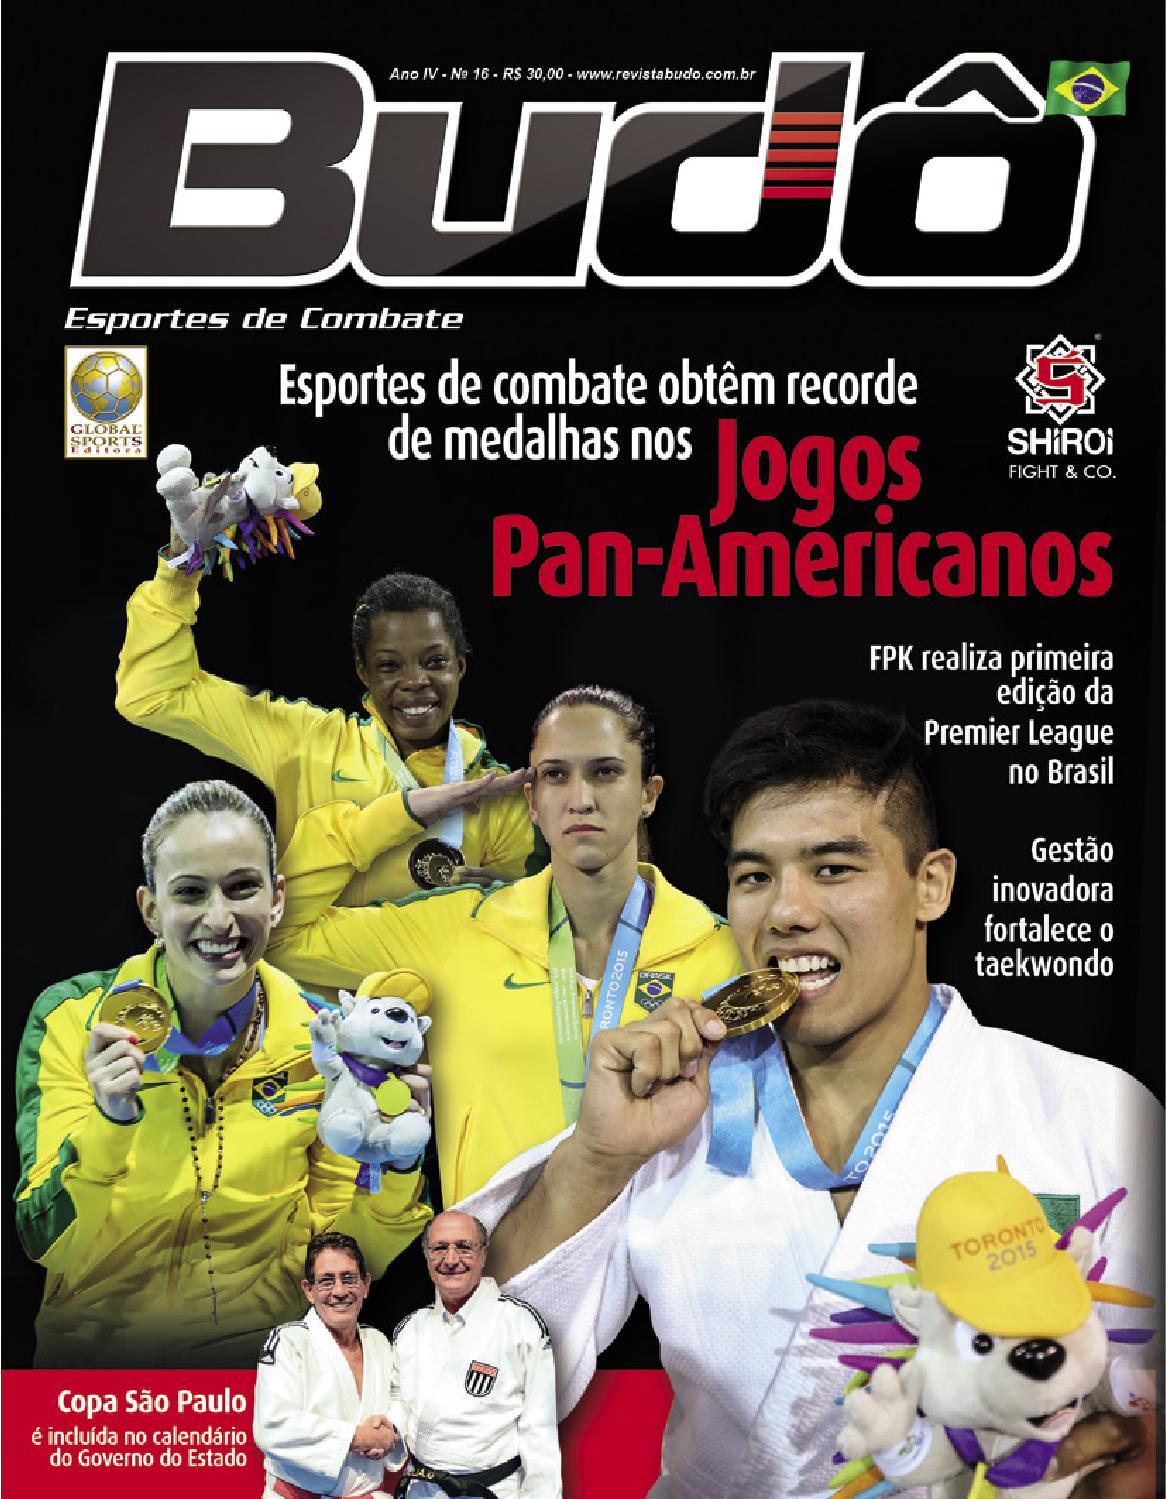 Revista Budô Nº 16 by Revista Budô - issuu 63b65c3f94d92